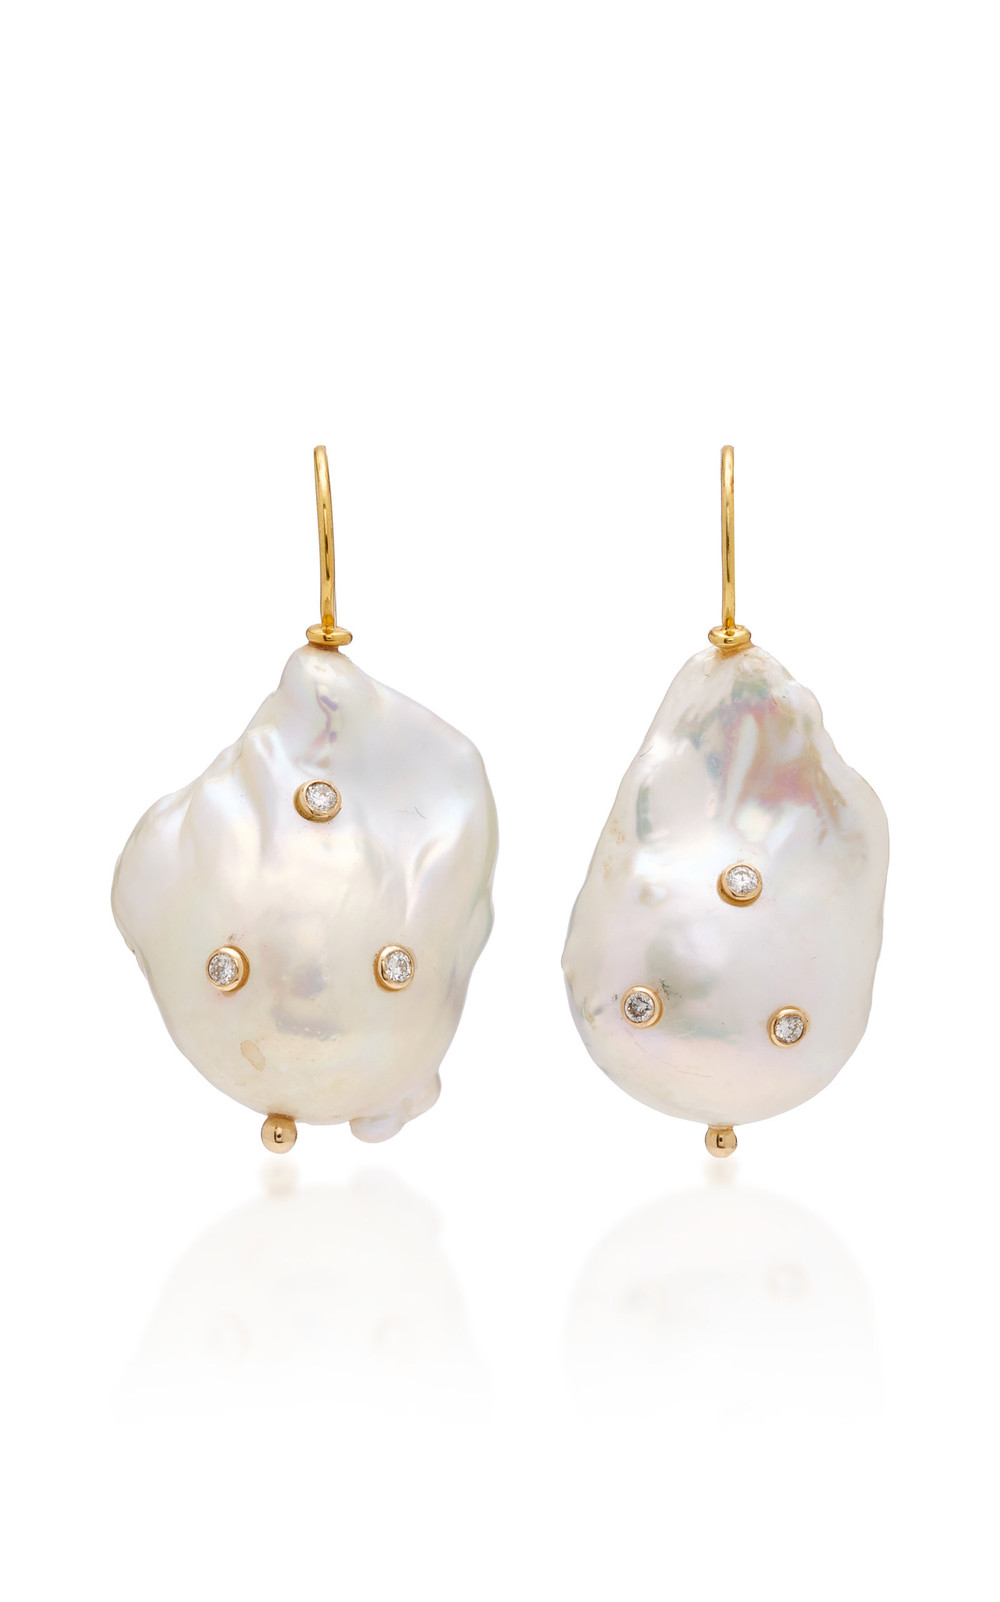 Ranjana Khan Pearl With Diamond Drop Earrings in white